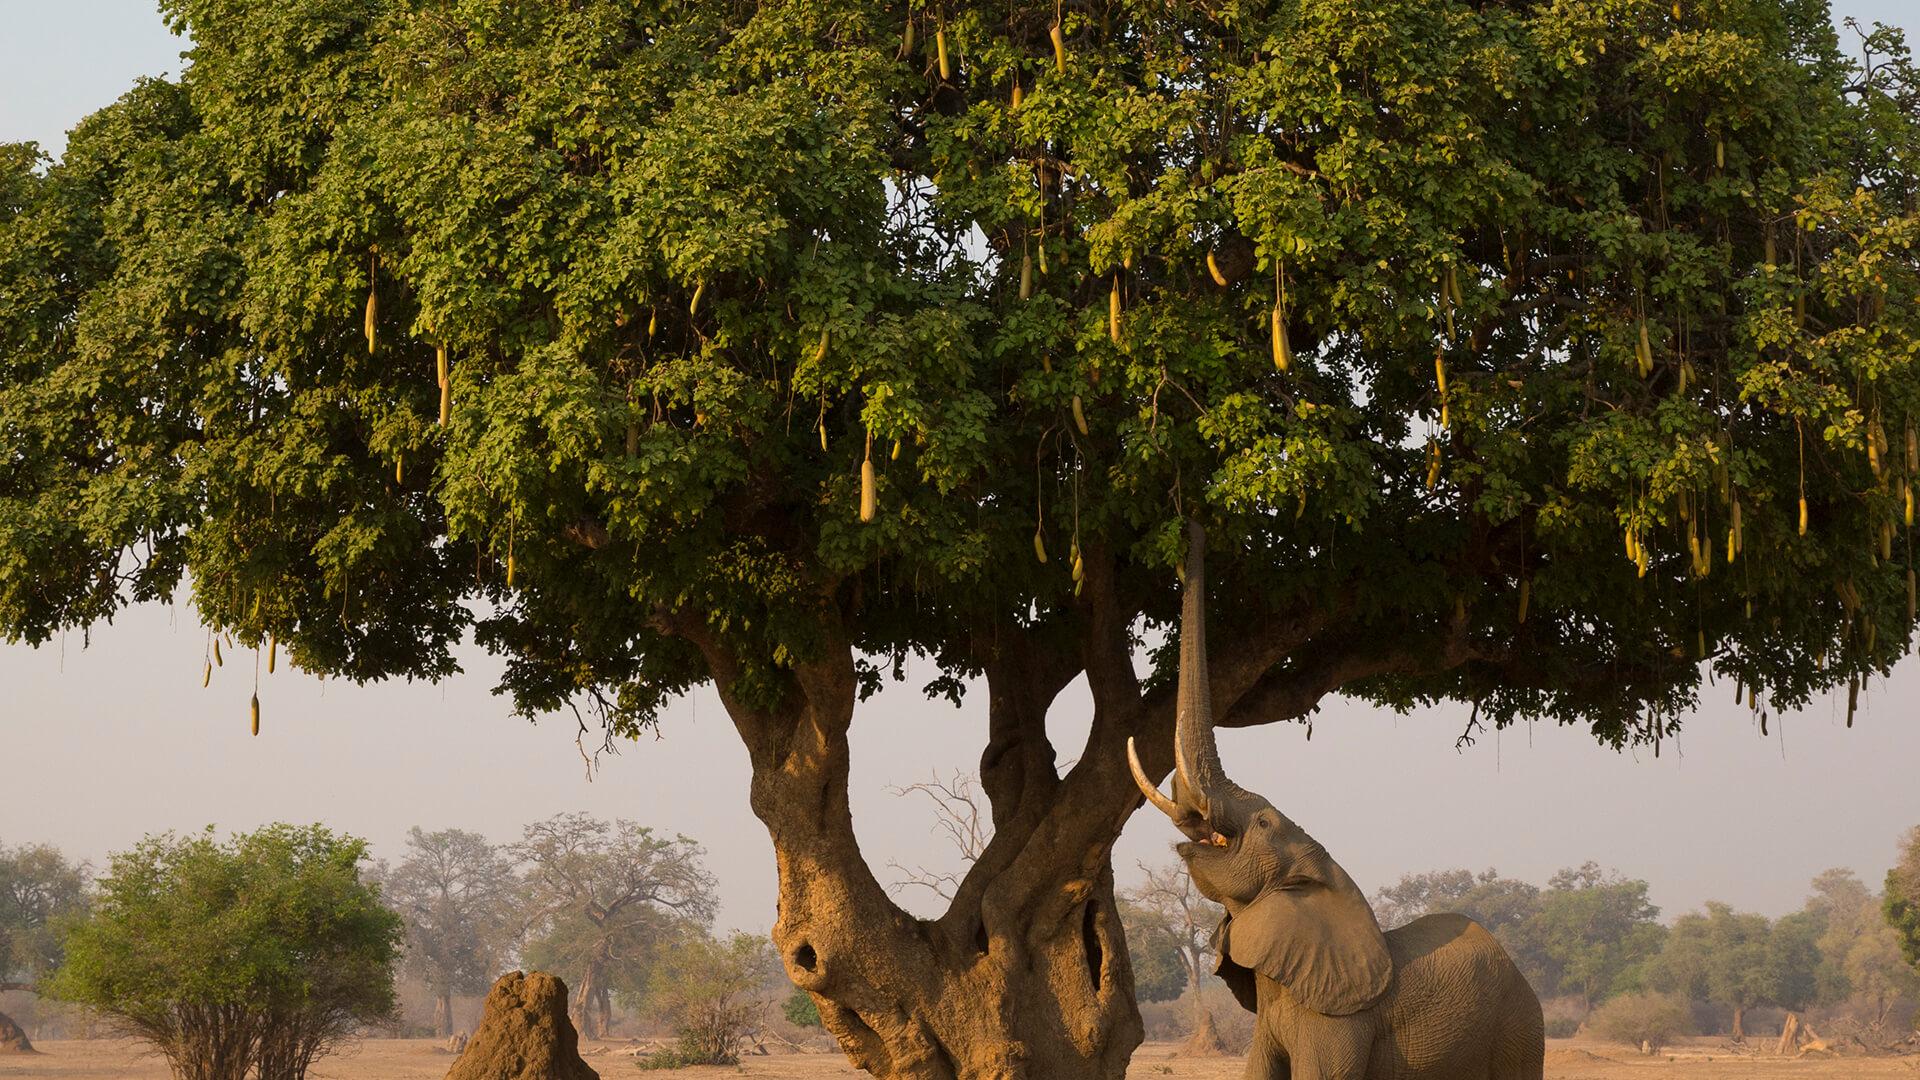 Trees   San Diego Zoo Animals & Plants